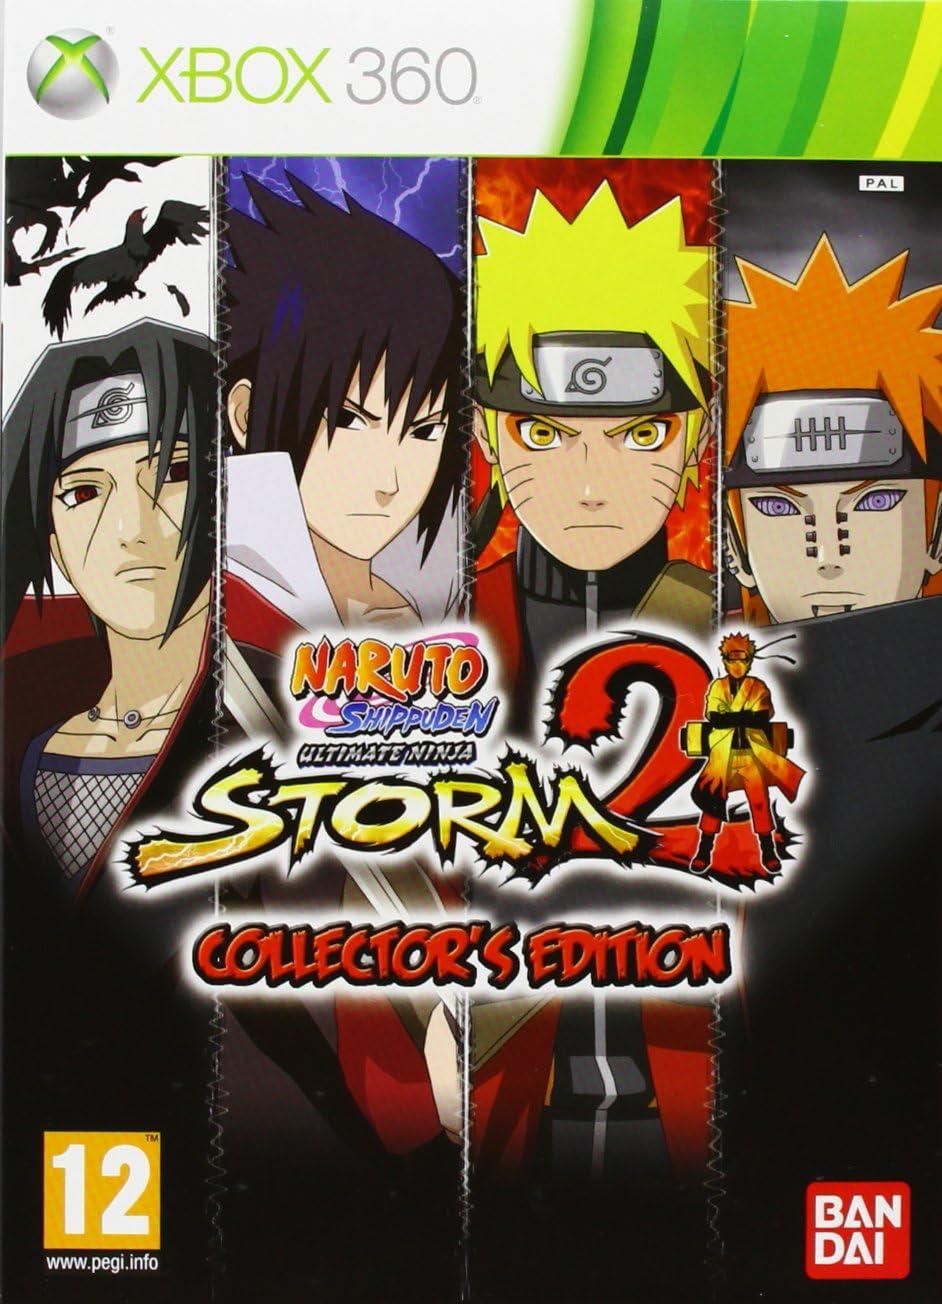 Naruto Shippuden Ultimate Ninja Storm 2 Collector S Edition Xbox 360 Amazon Co Uk Pc Video Games